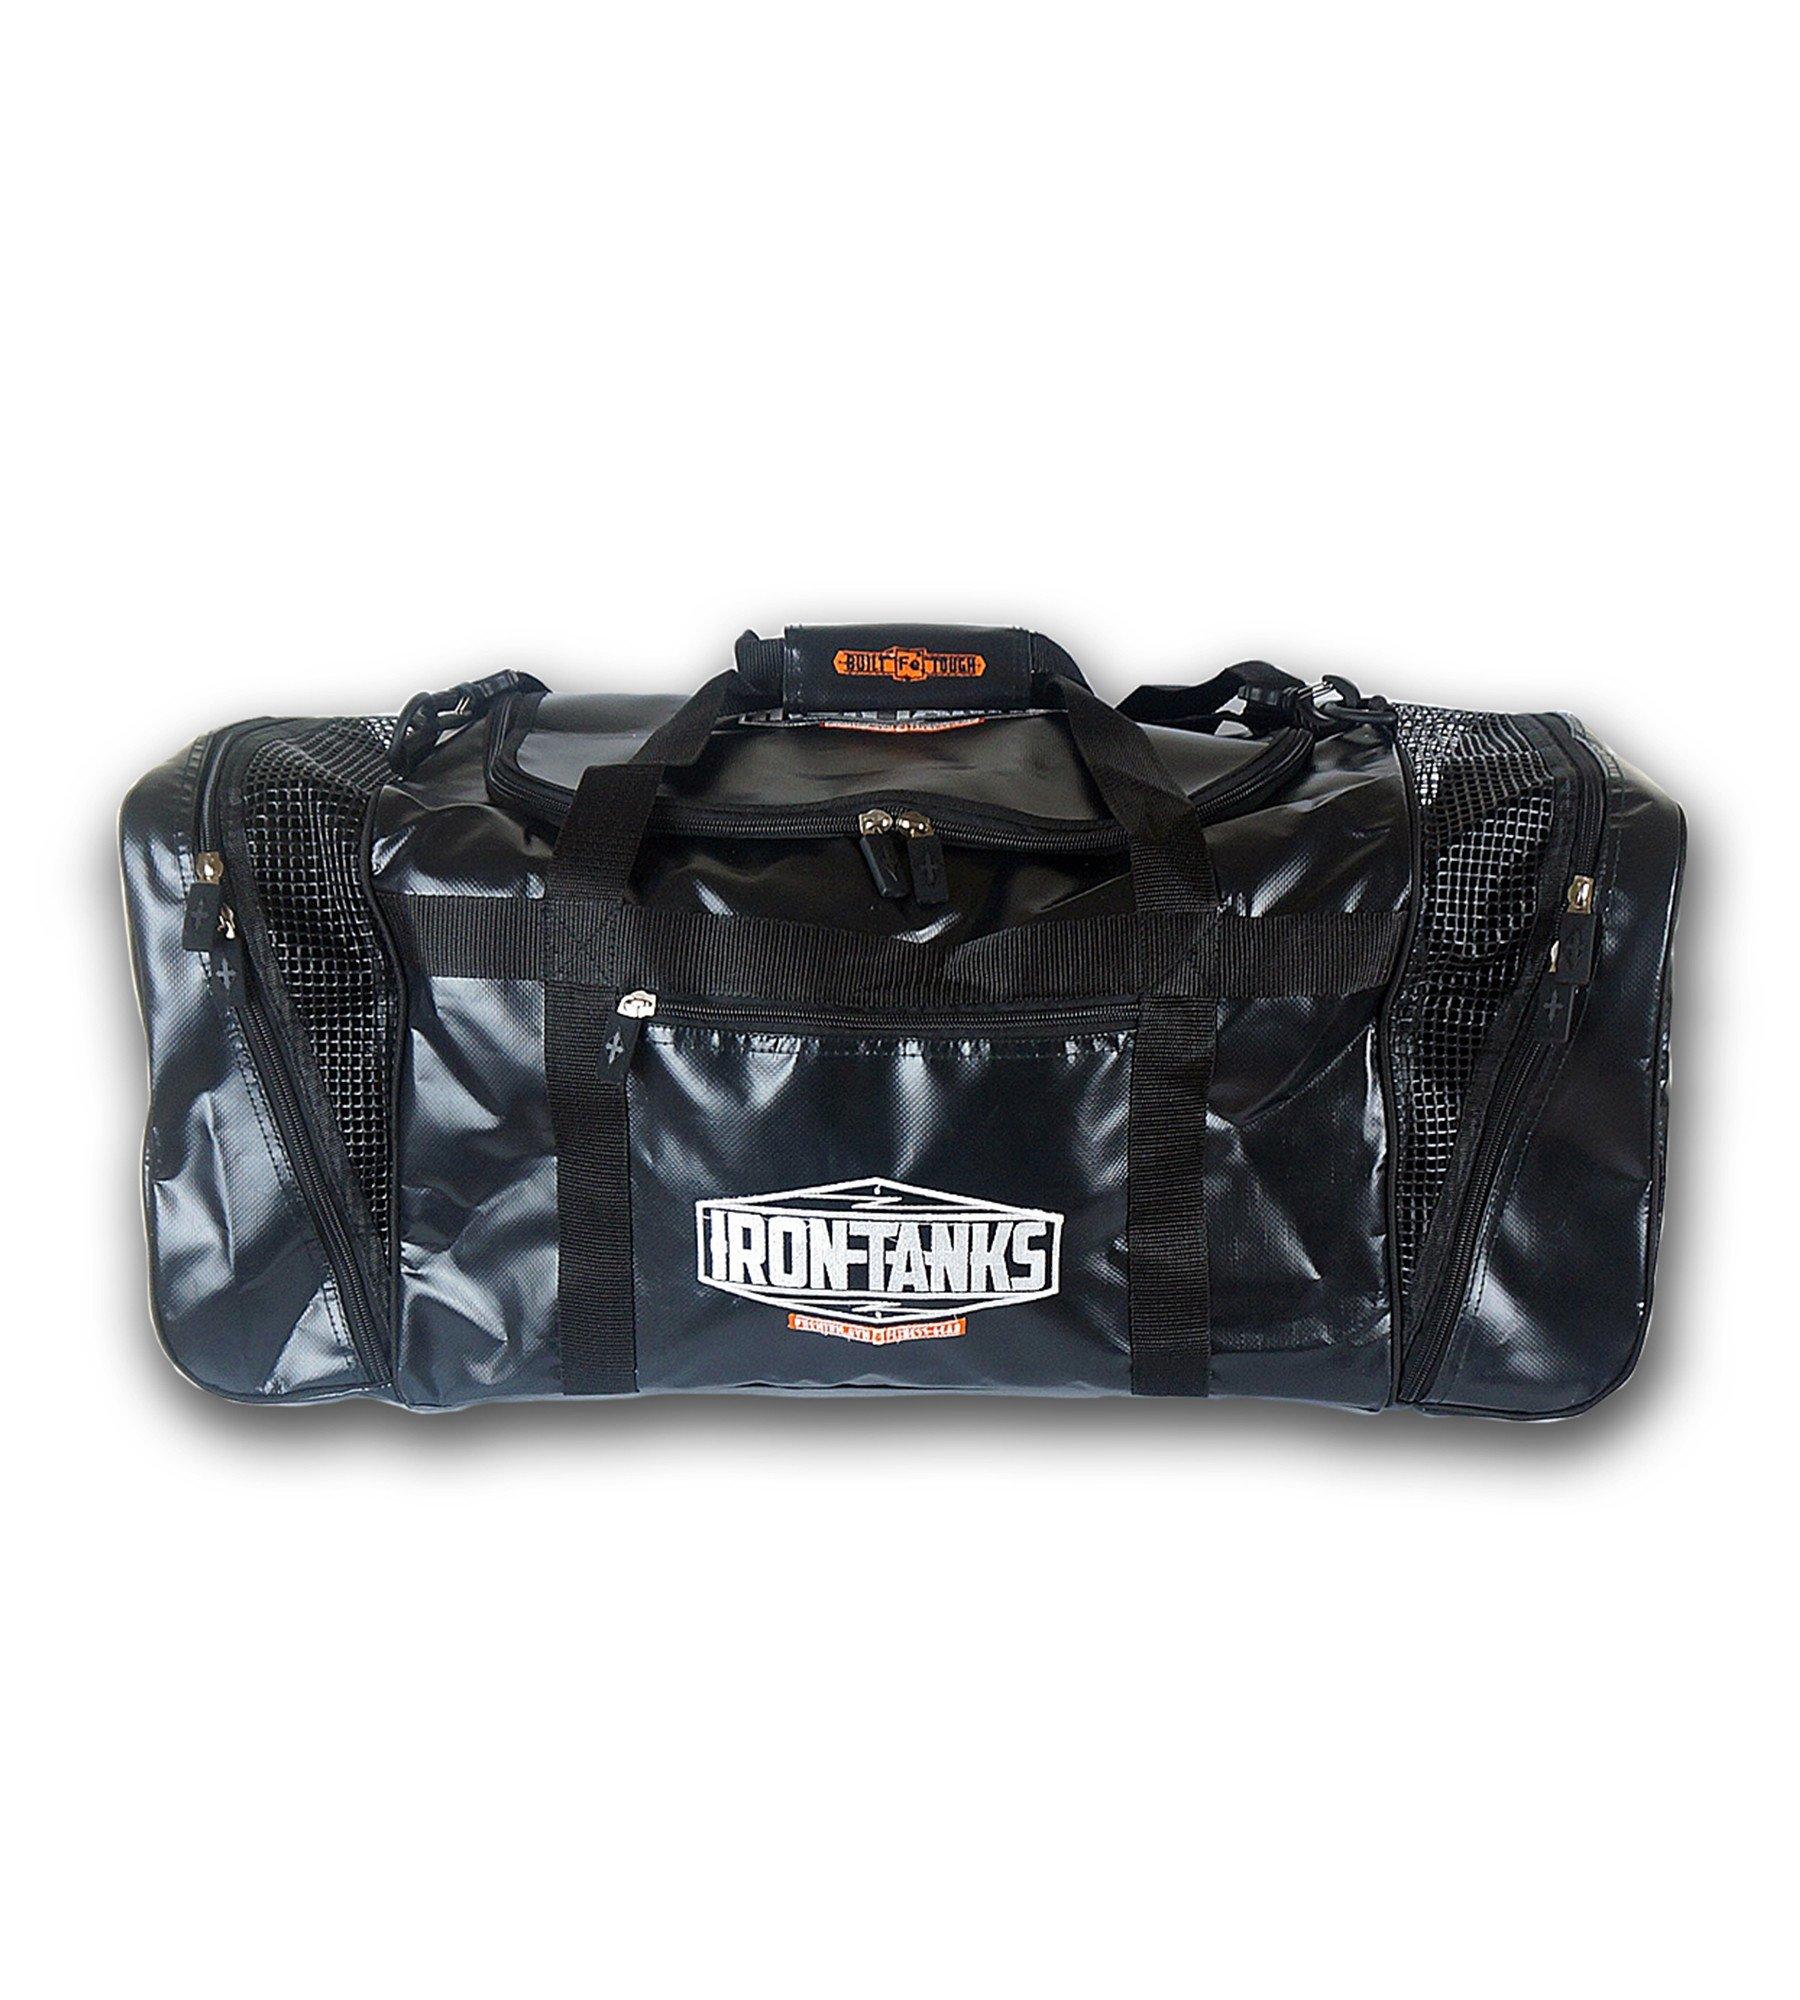 Iron Tanks Pro Gym Bag Black - Bodybuilding Powerlifting Workout Duffel Overnight